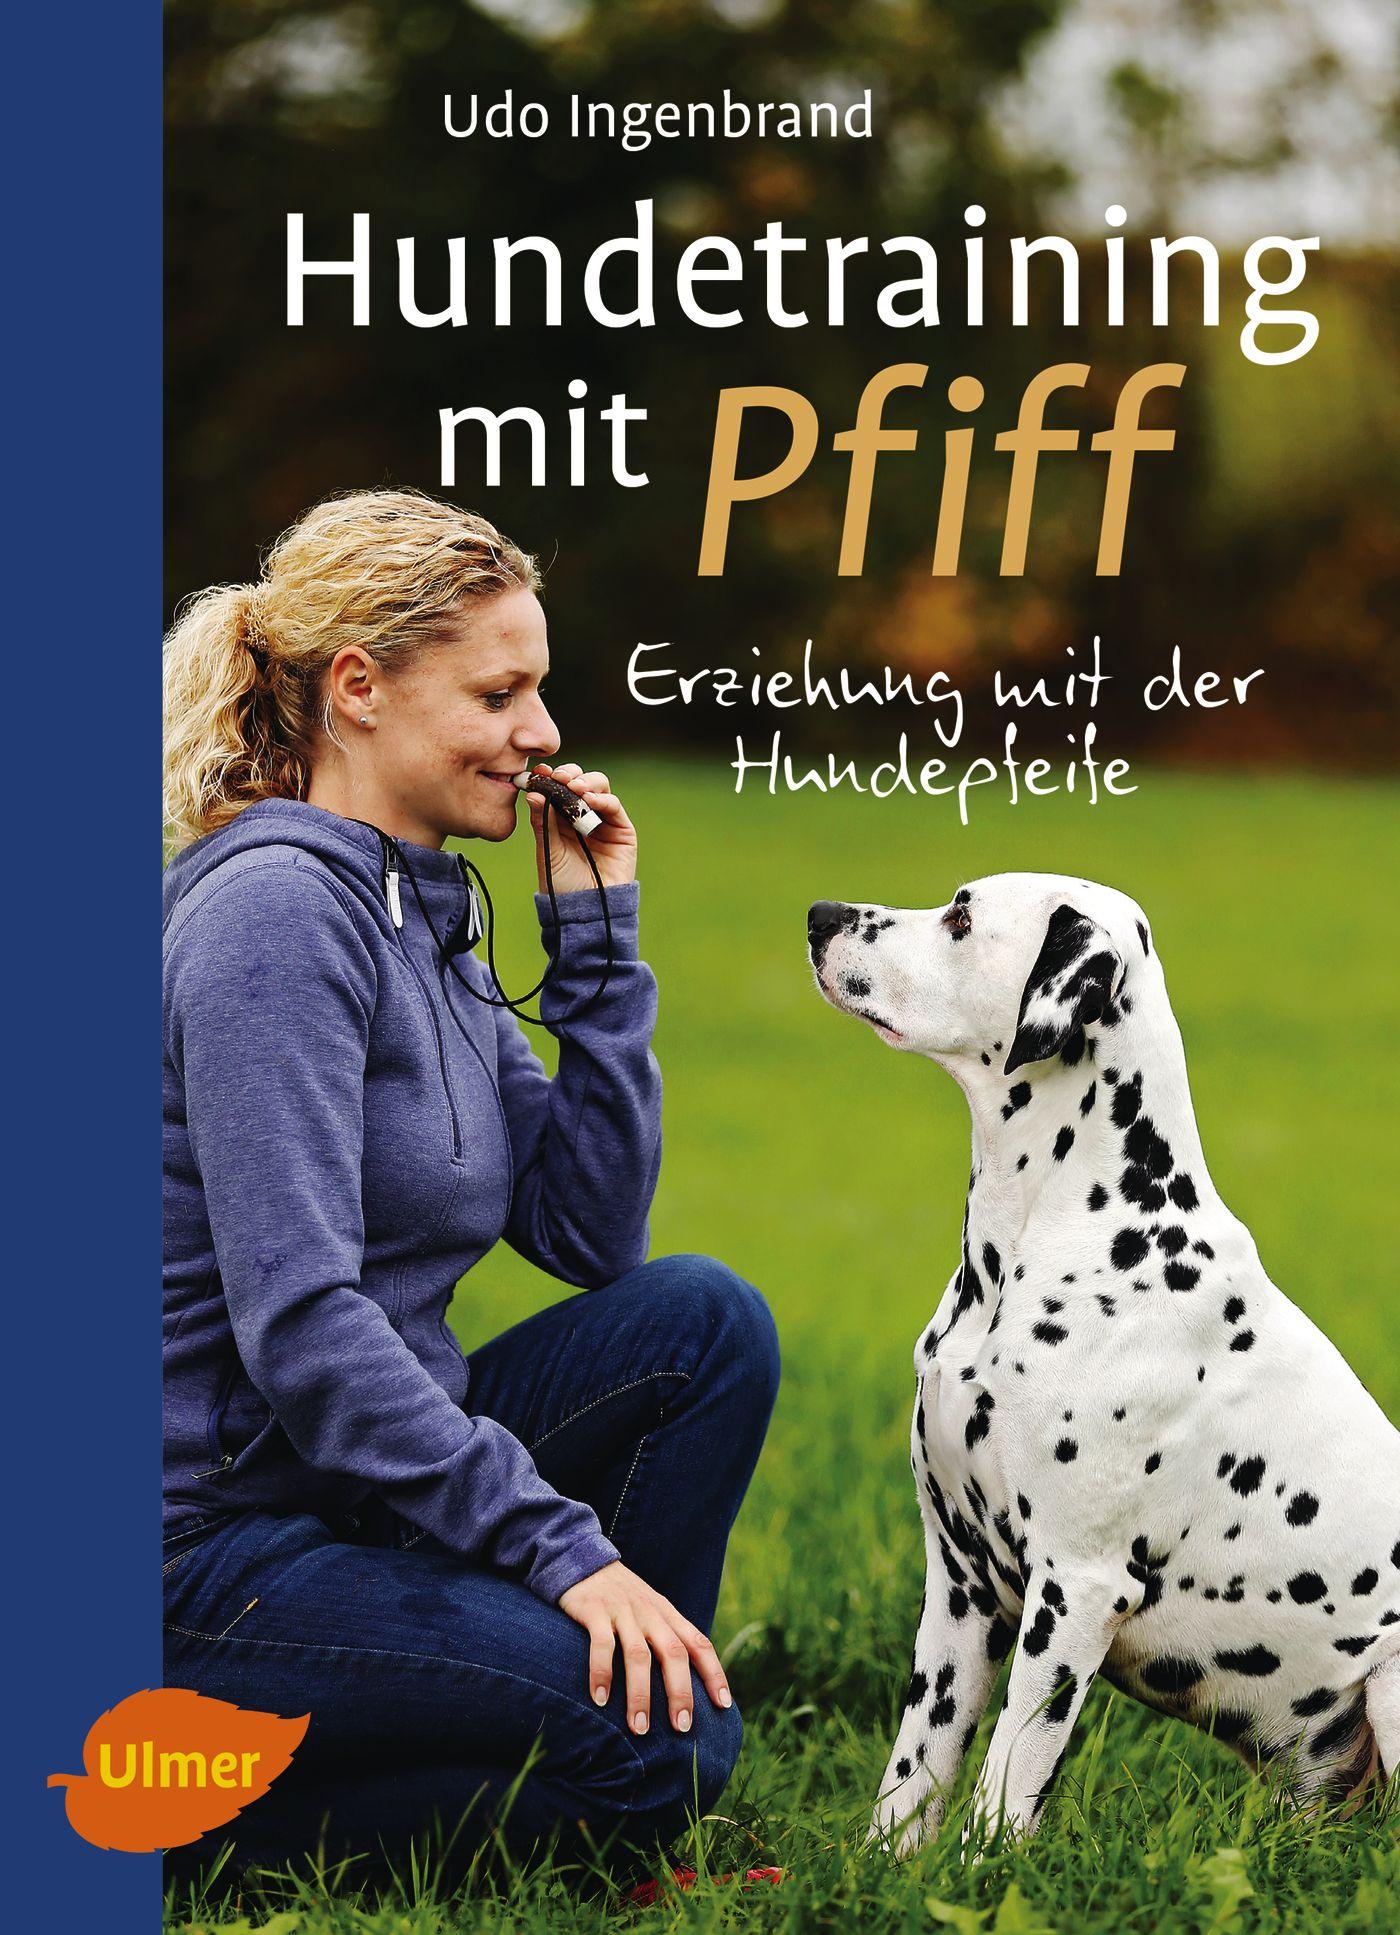 Hundetraining mit Pfiff Udo Ingenbrand